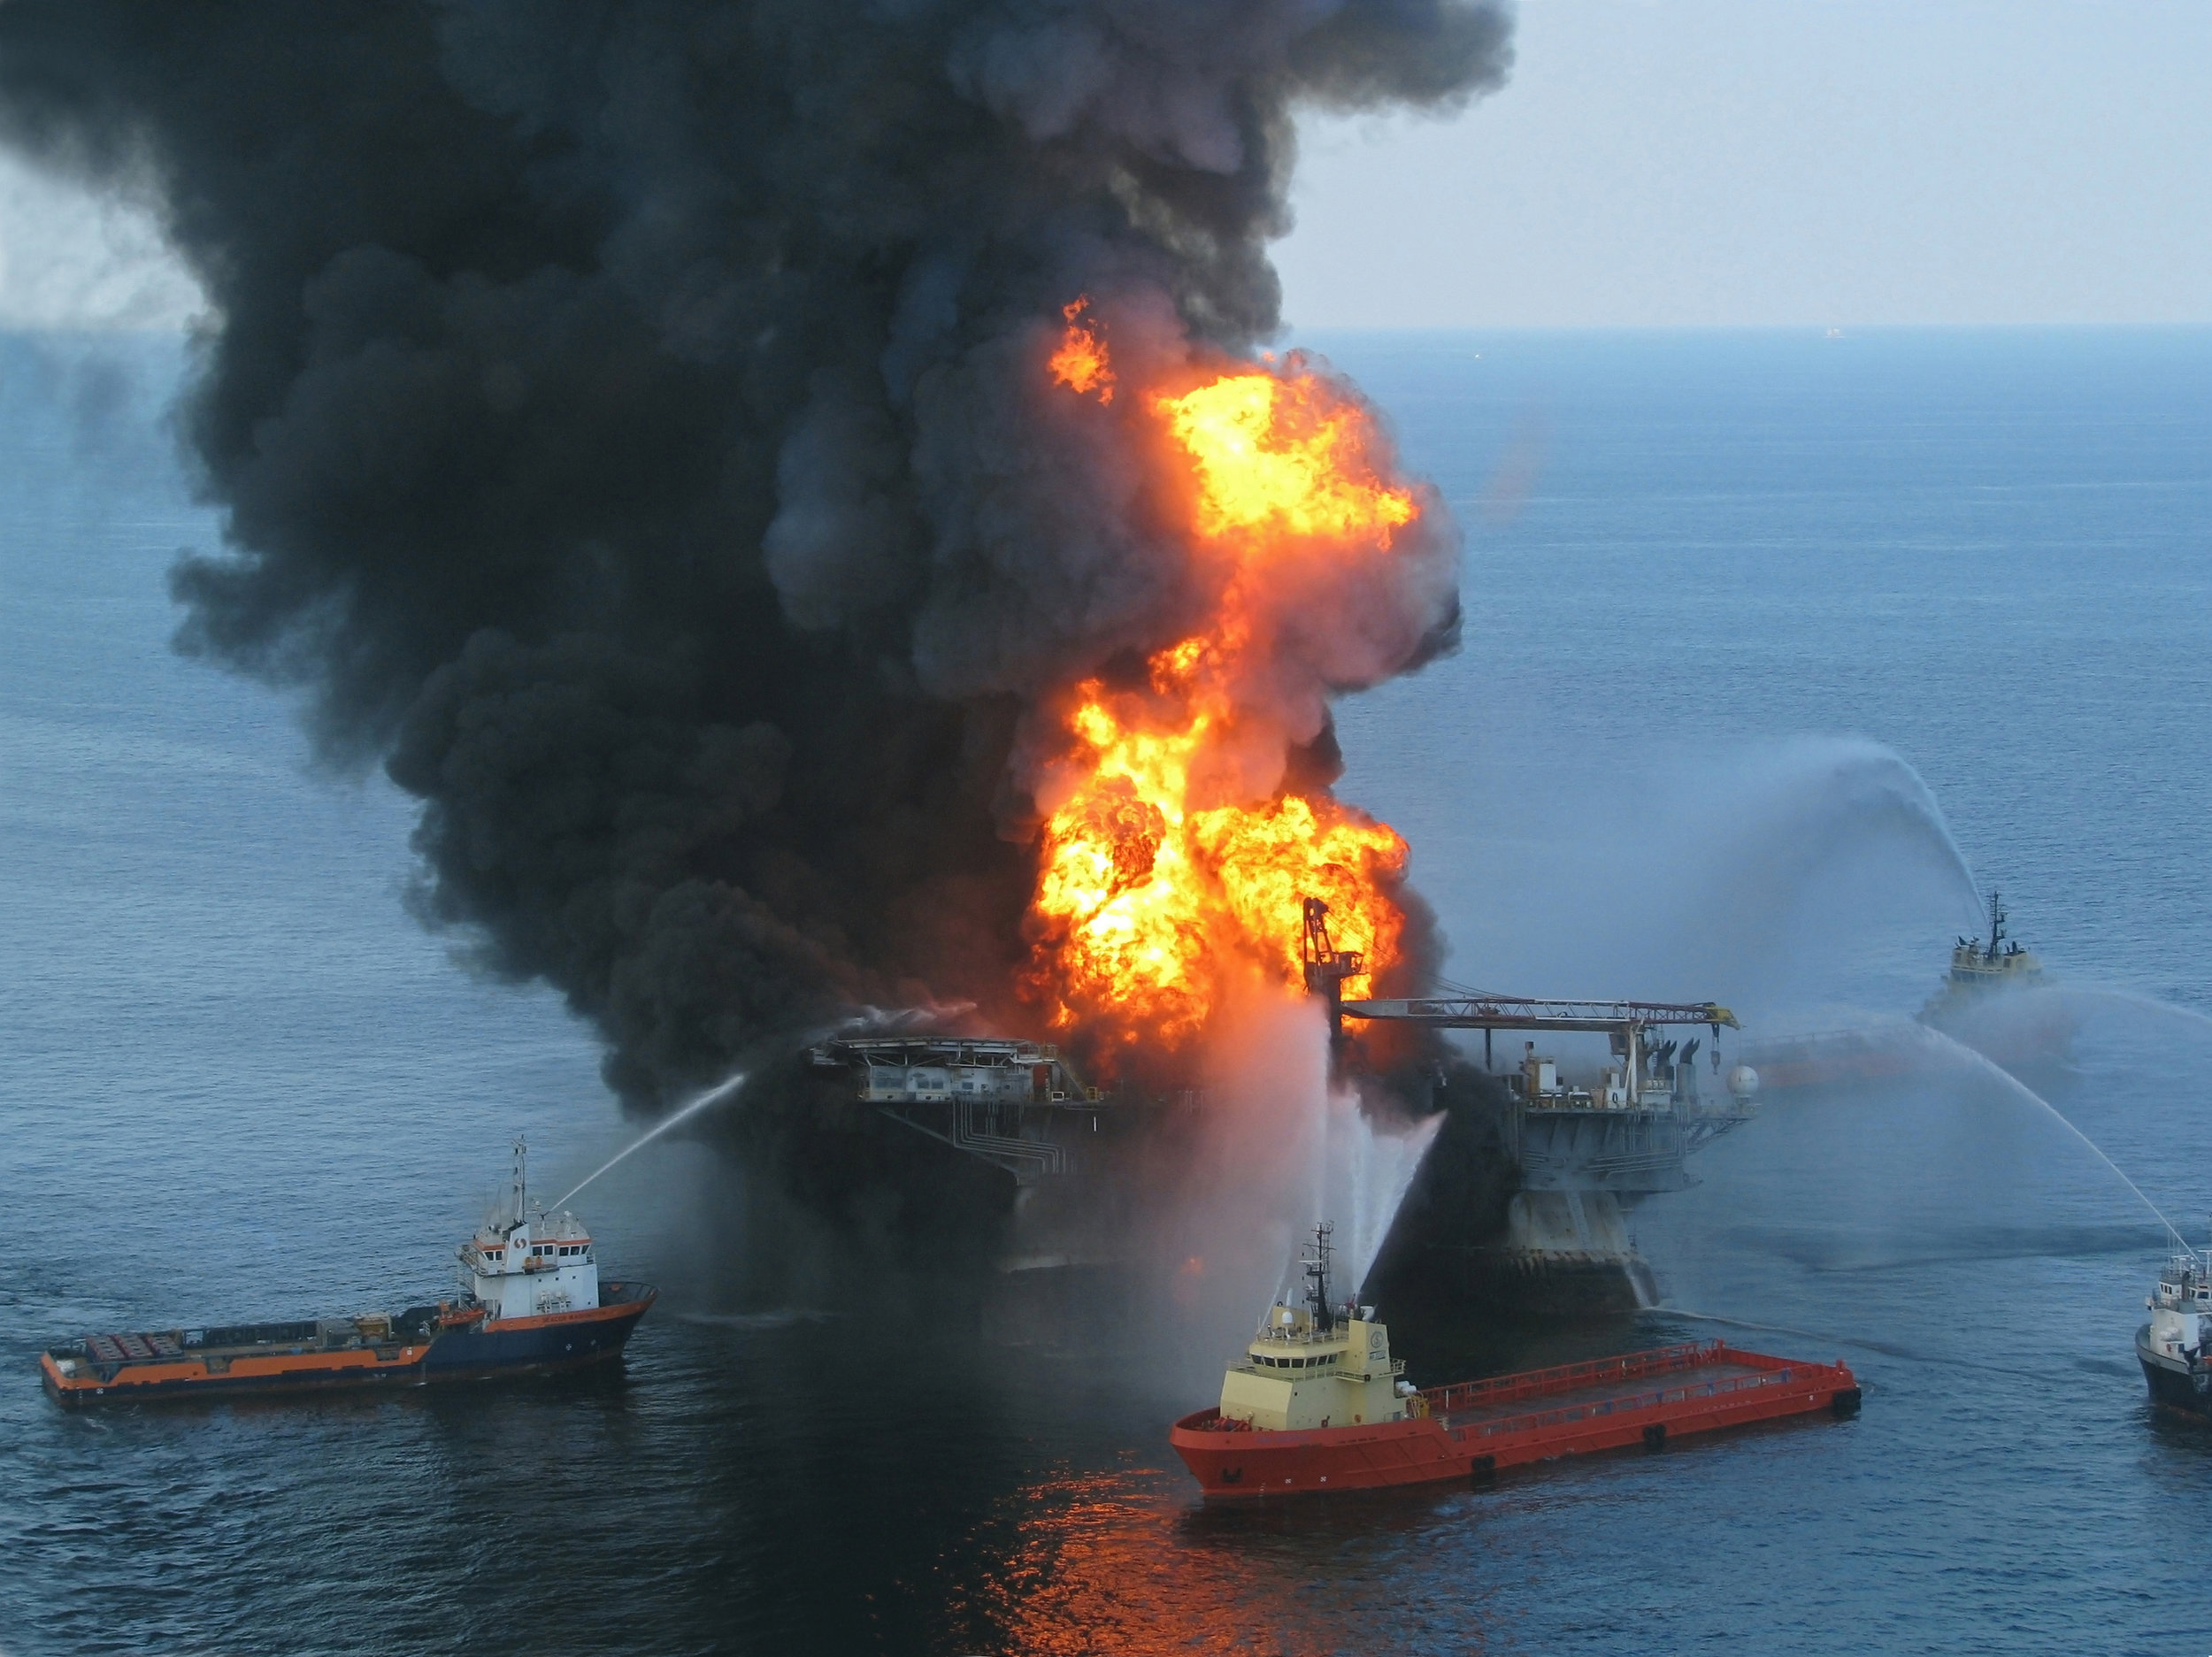 Deepwater_Horizon_offshore_drilling_unit_on_fire_2010.jpg